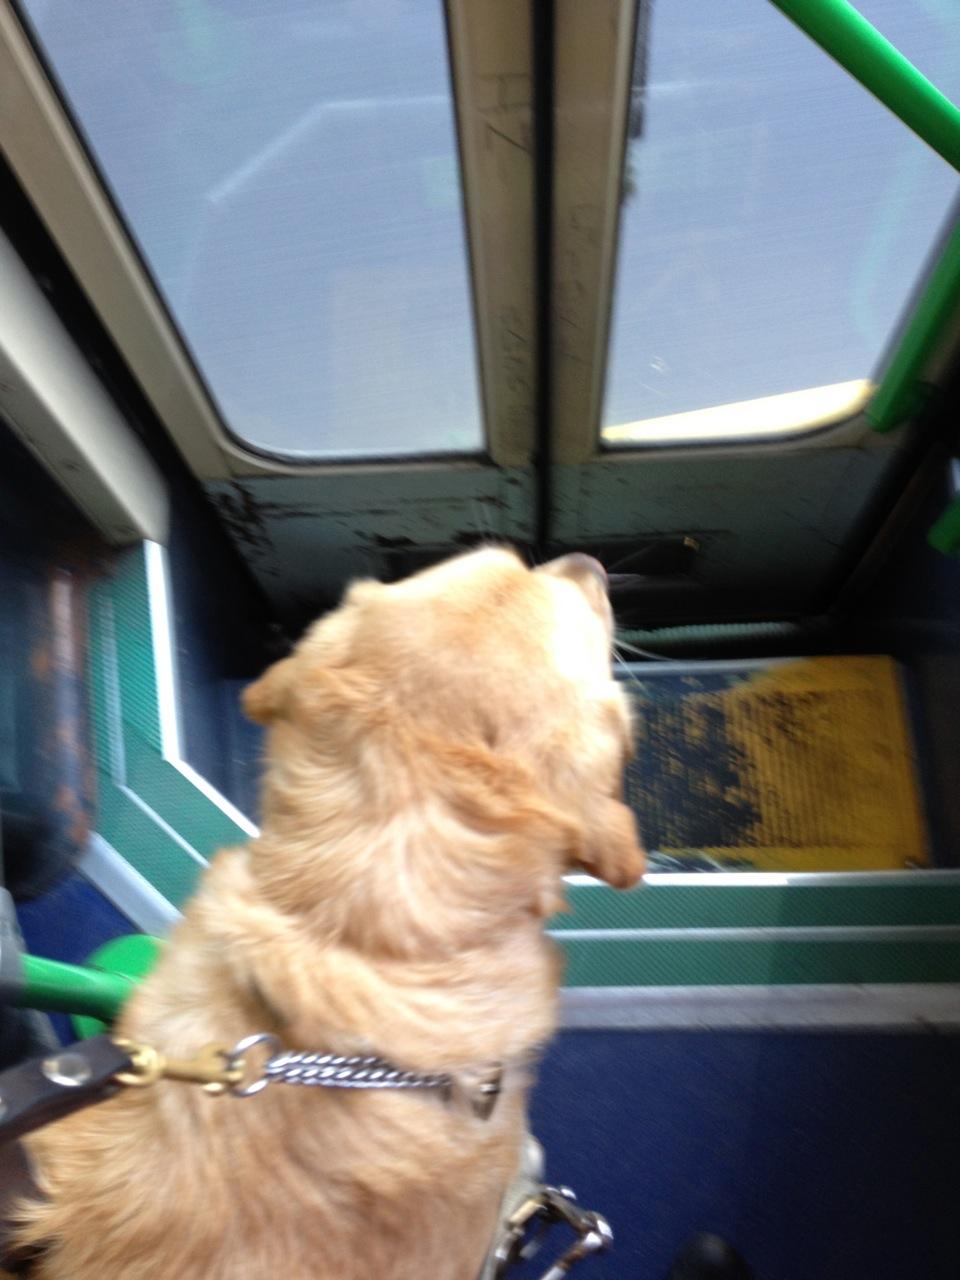 Britta leaving the tram